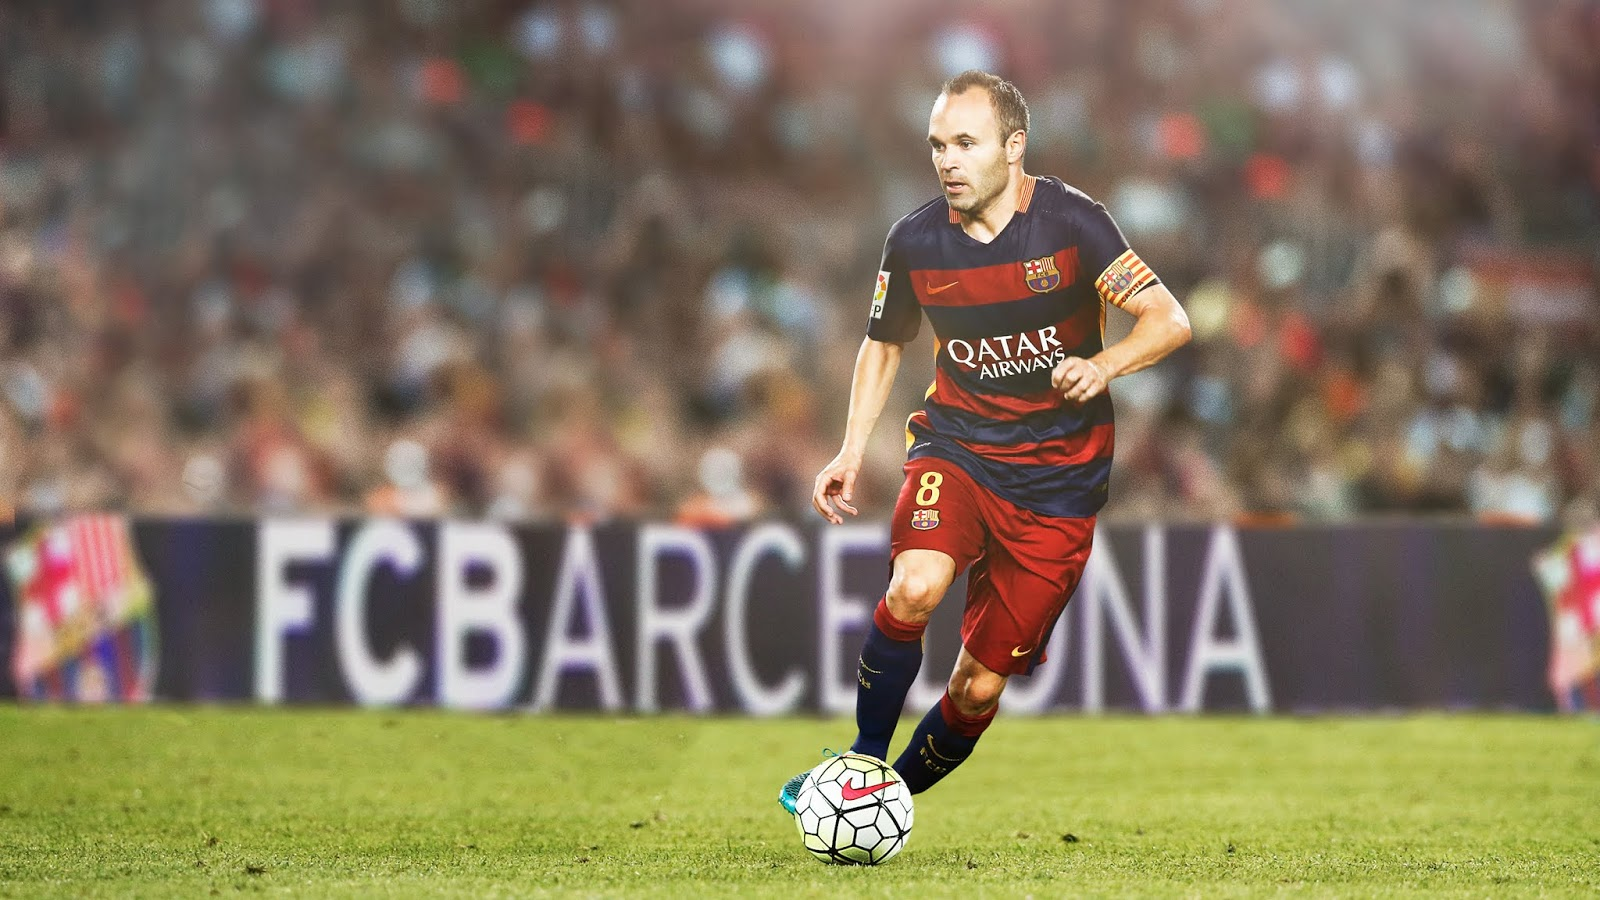 Andres Iniesta, FC Barcelona, HD, Sports